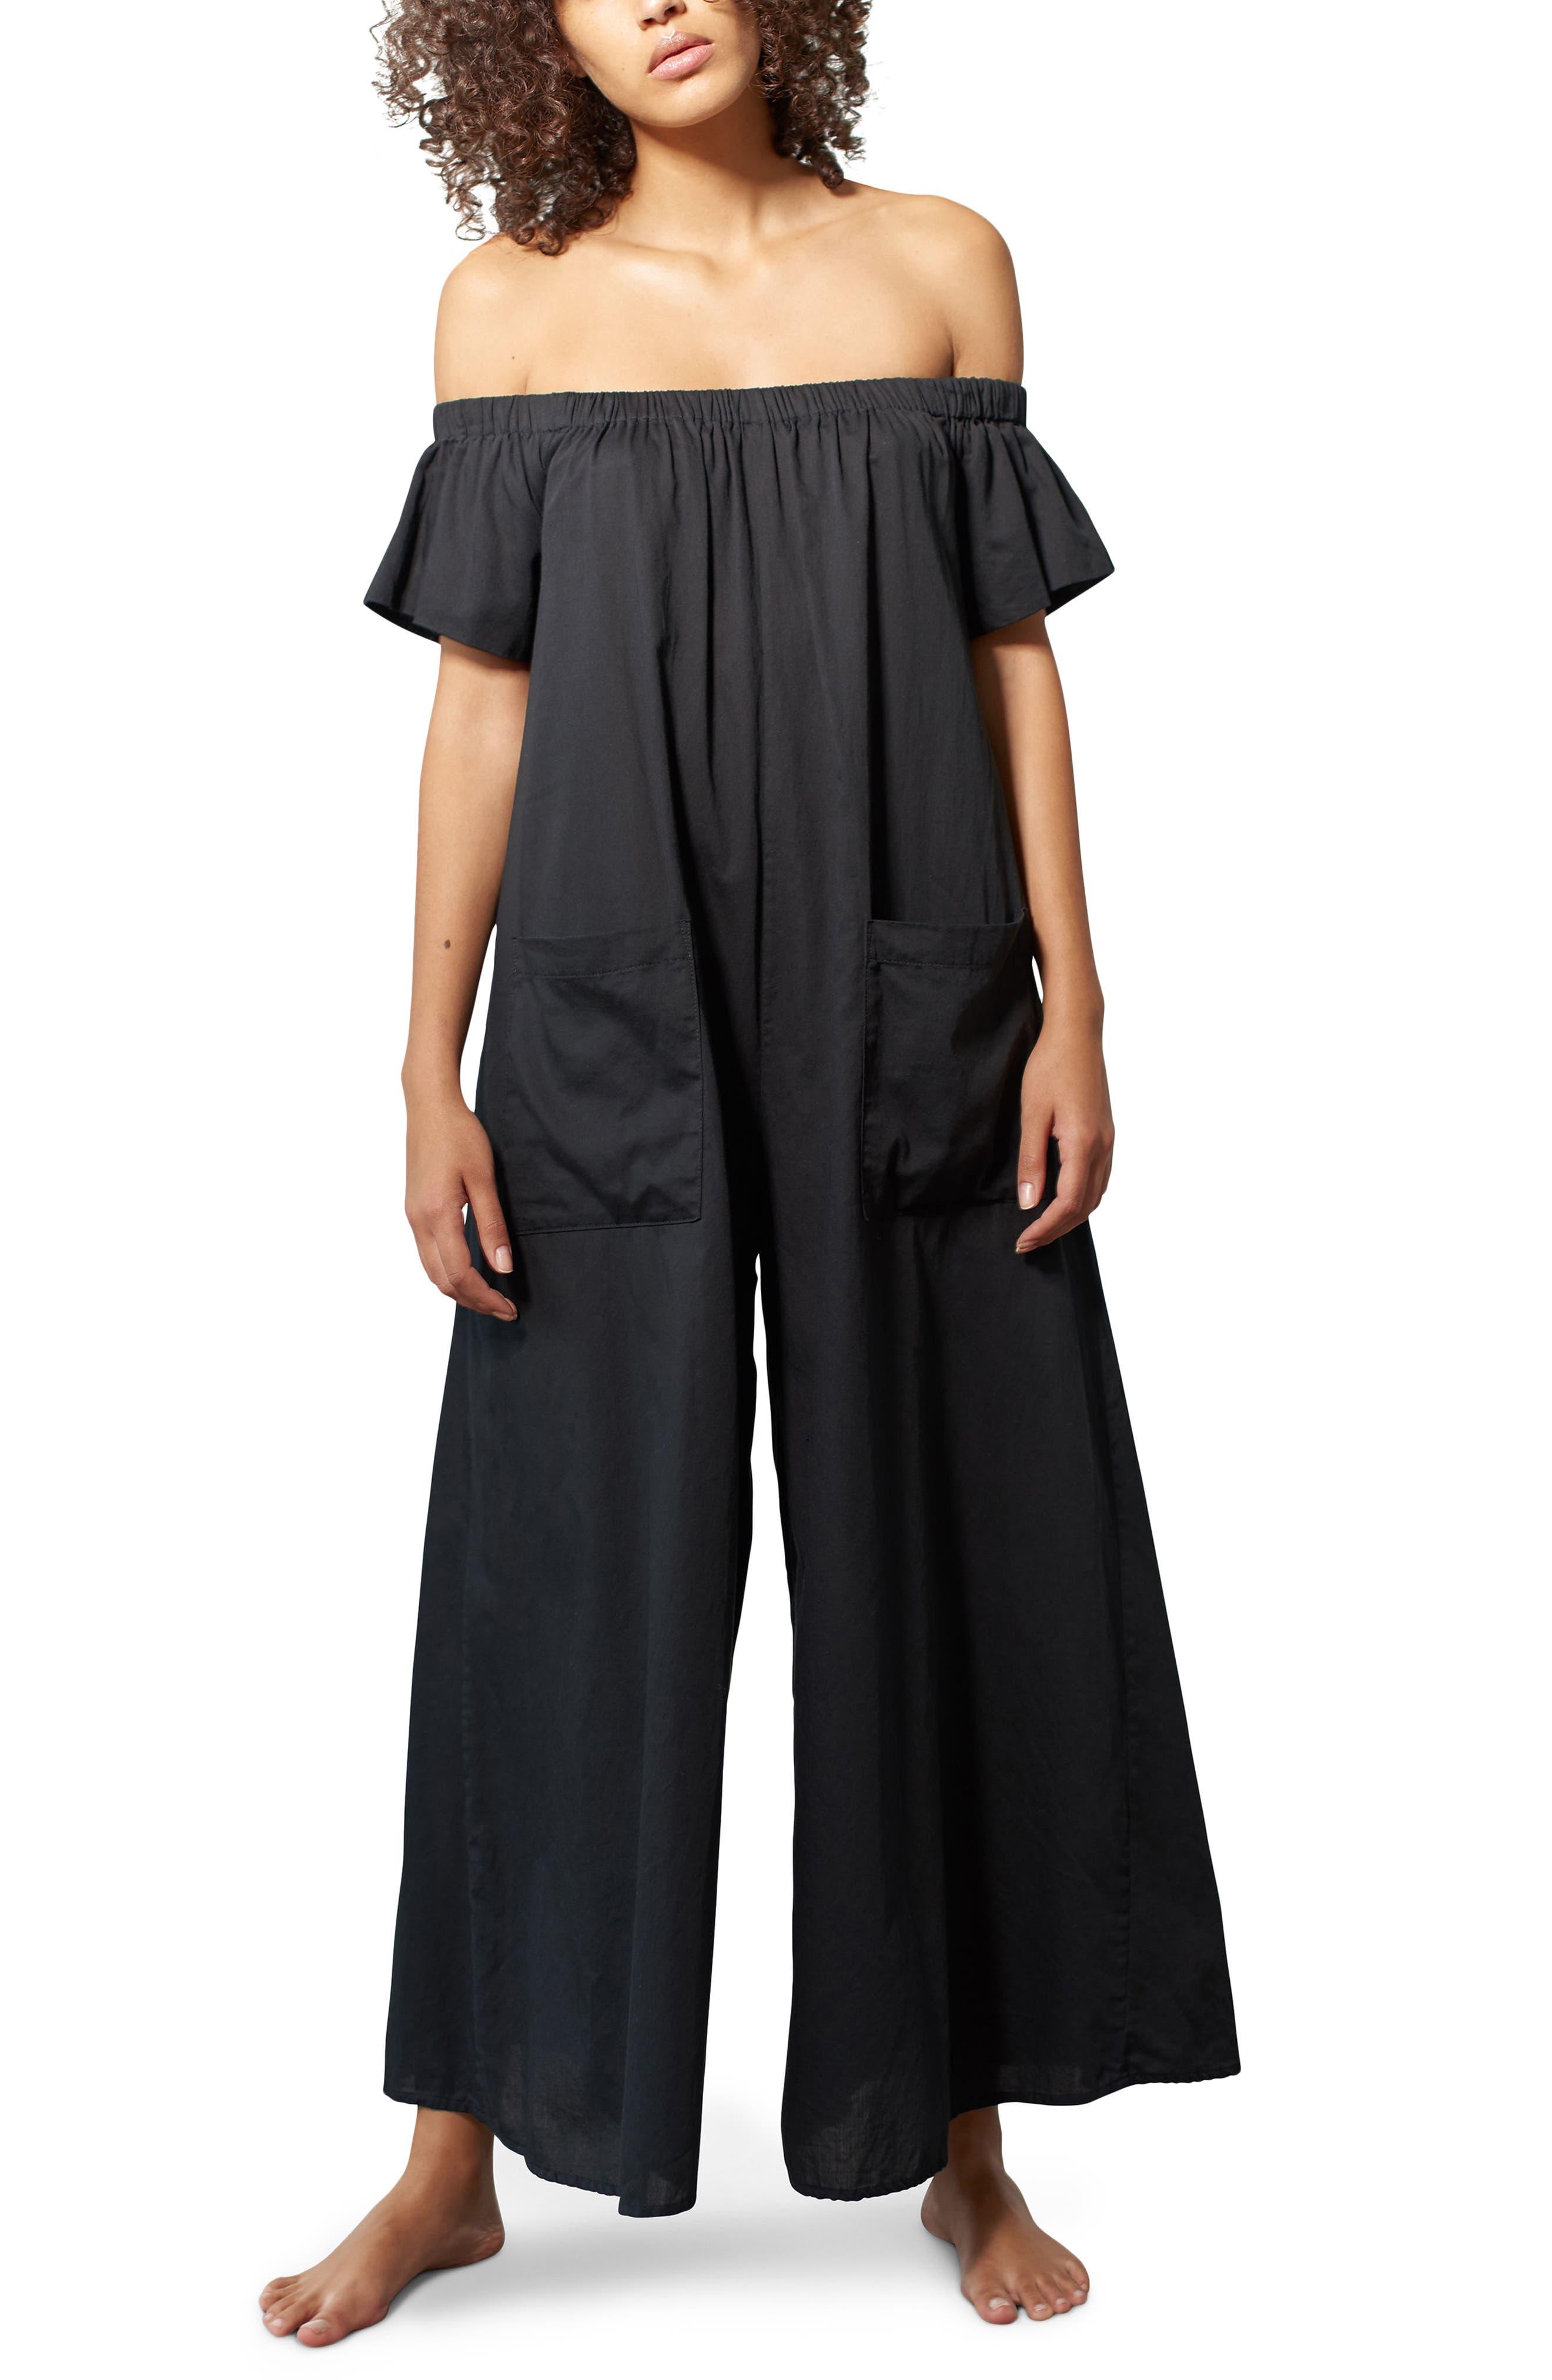 Blanche Off the Shoulder Cover-Up Jumpsuit,                         Main,                         color, Black